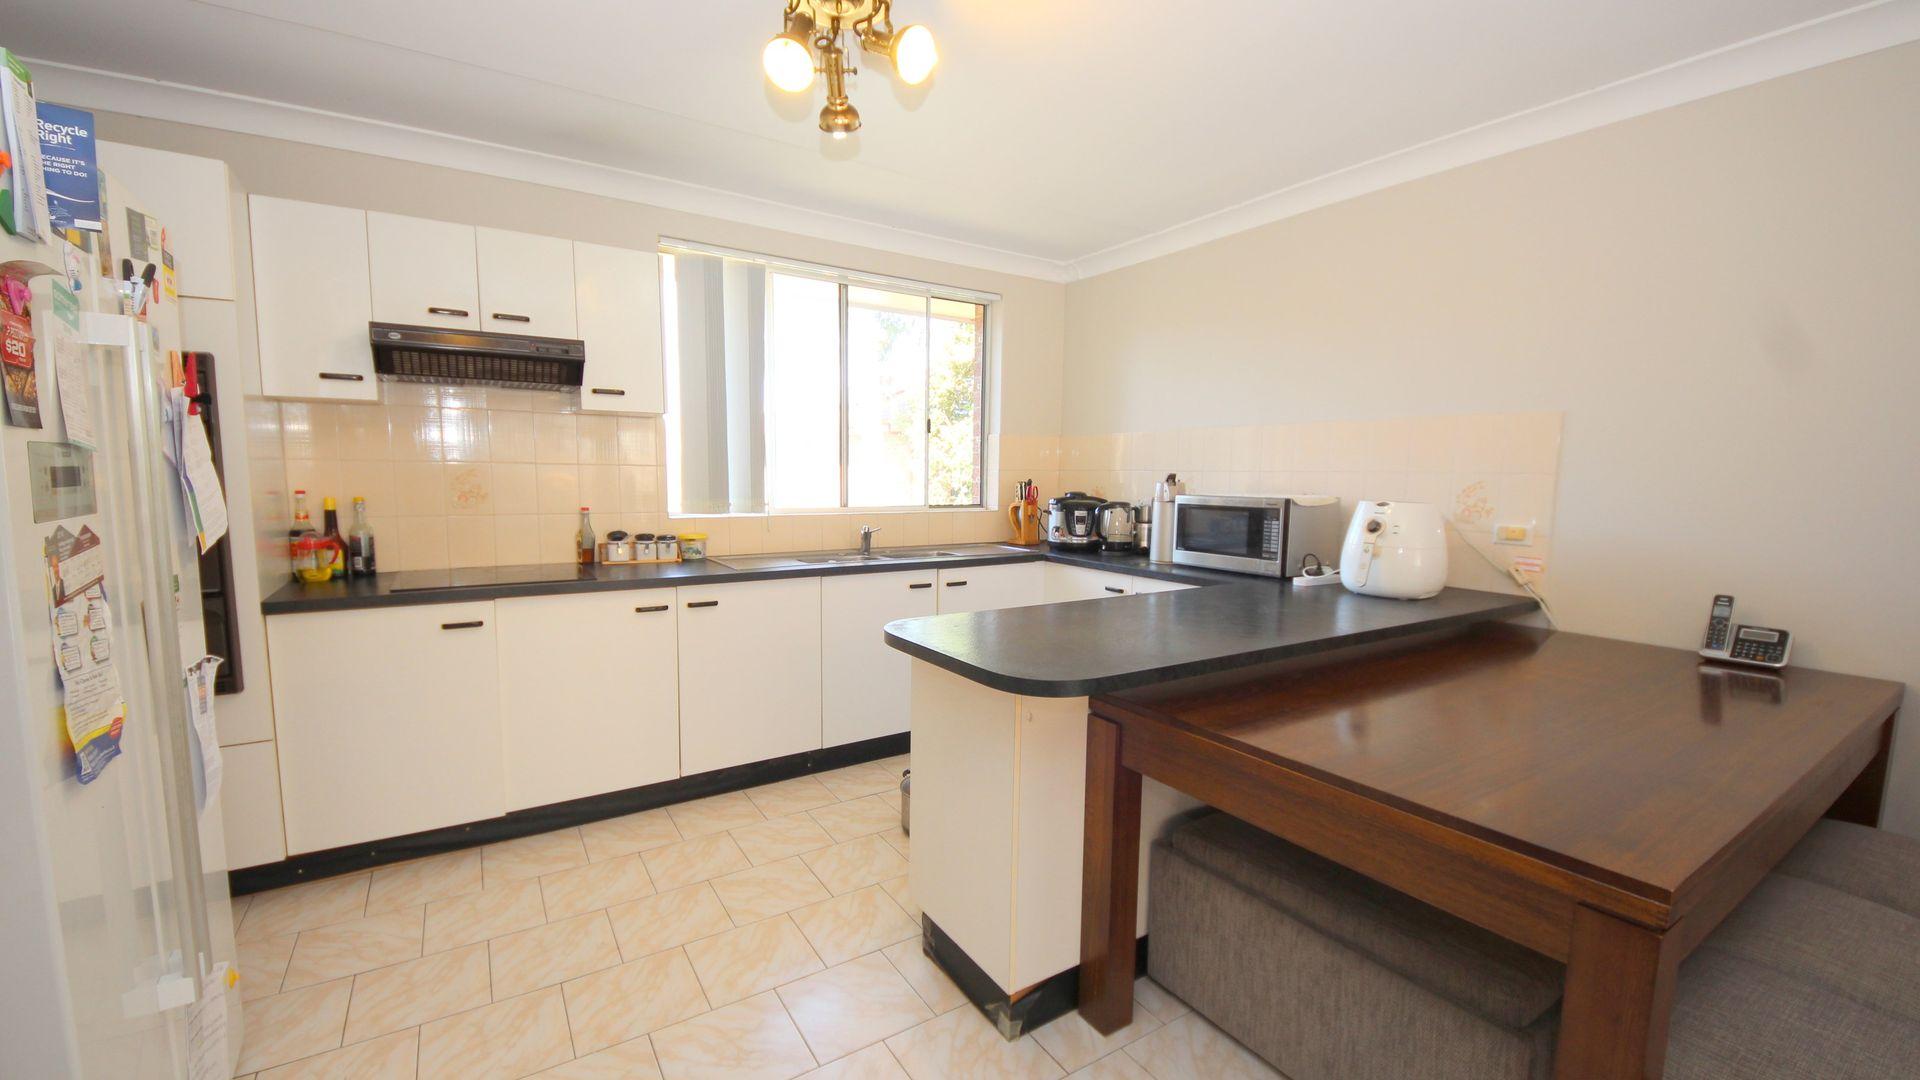 2/19 Dellwood Street, Bankstown NSW 2200, Image 2